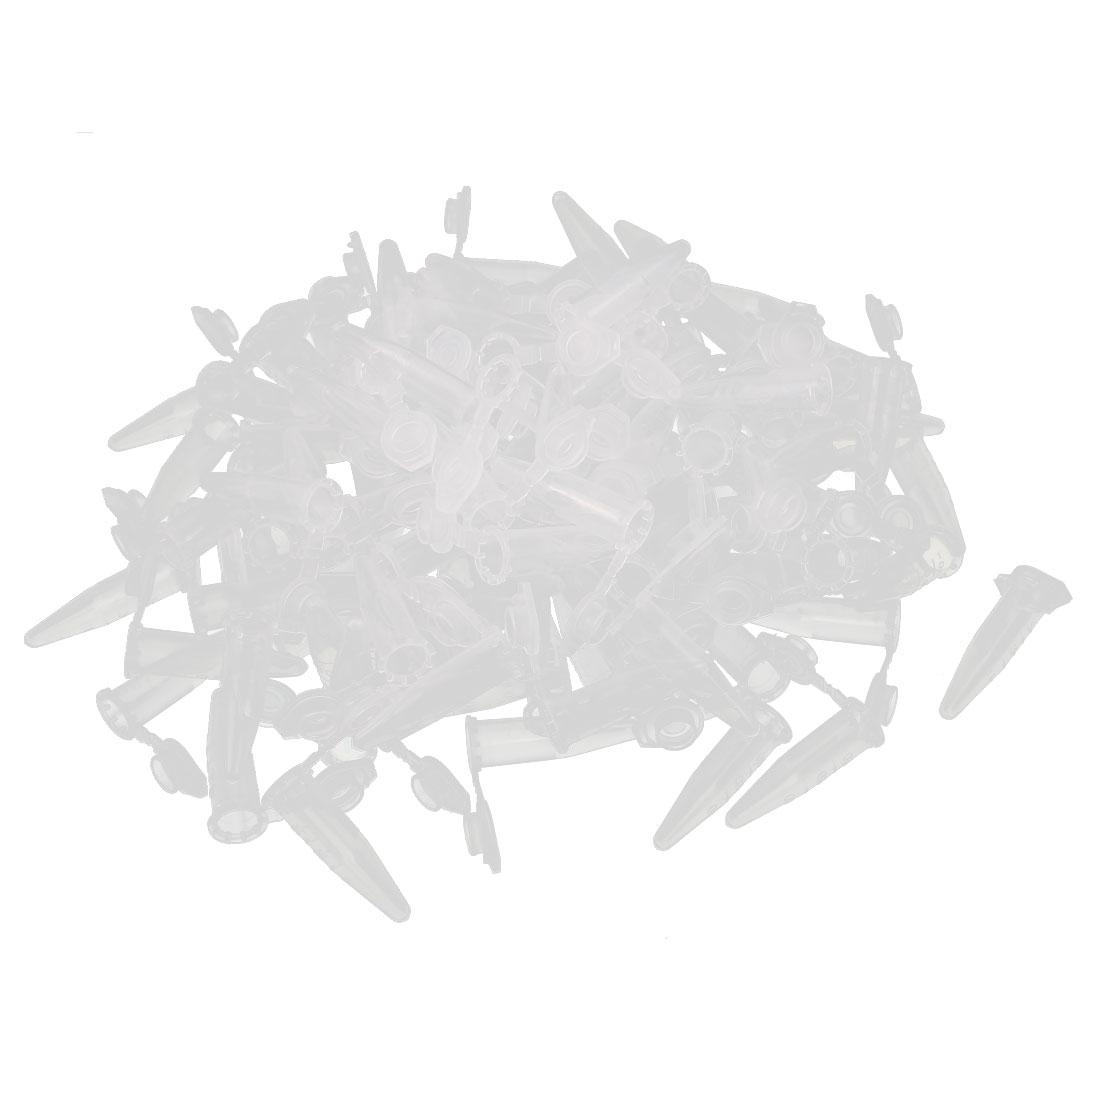 100Pcs 0.5ml Plastic Clear EP Tube Centrifuge Tubes for Laboratory w Graduated